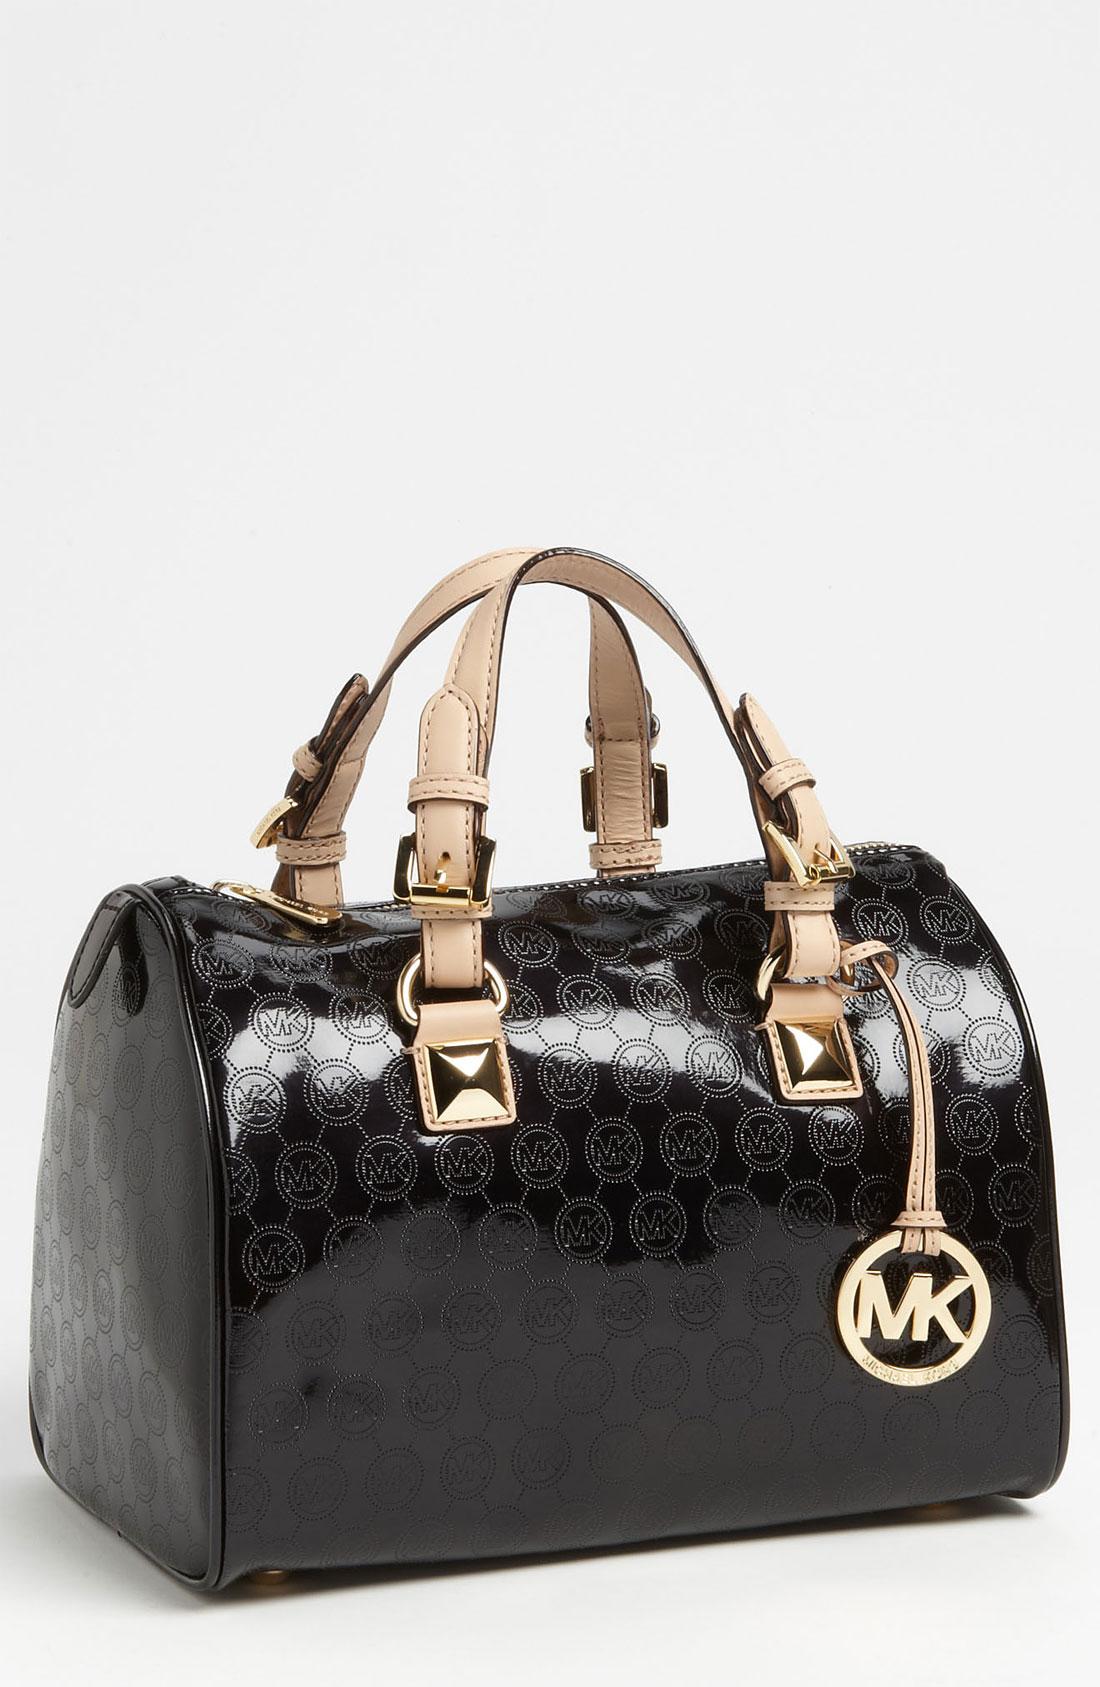 Reduced Michael Kors Grayson Shoulder - Bags Michael By Michael Kors Grayson Logo Medium Satchel Black